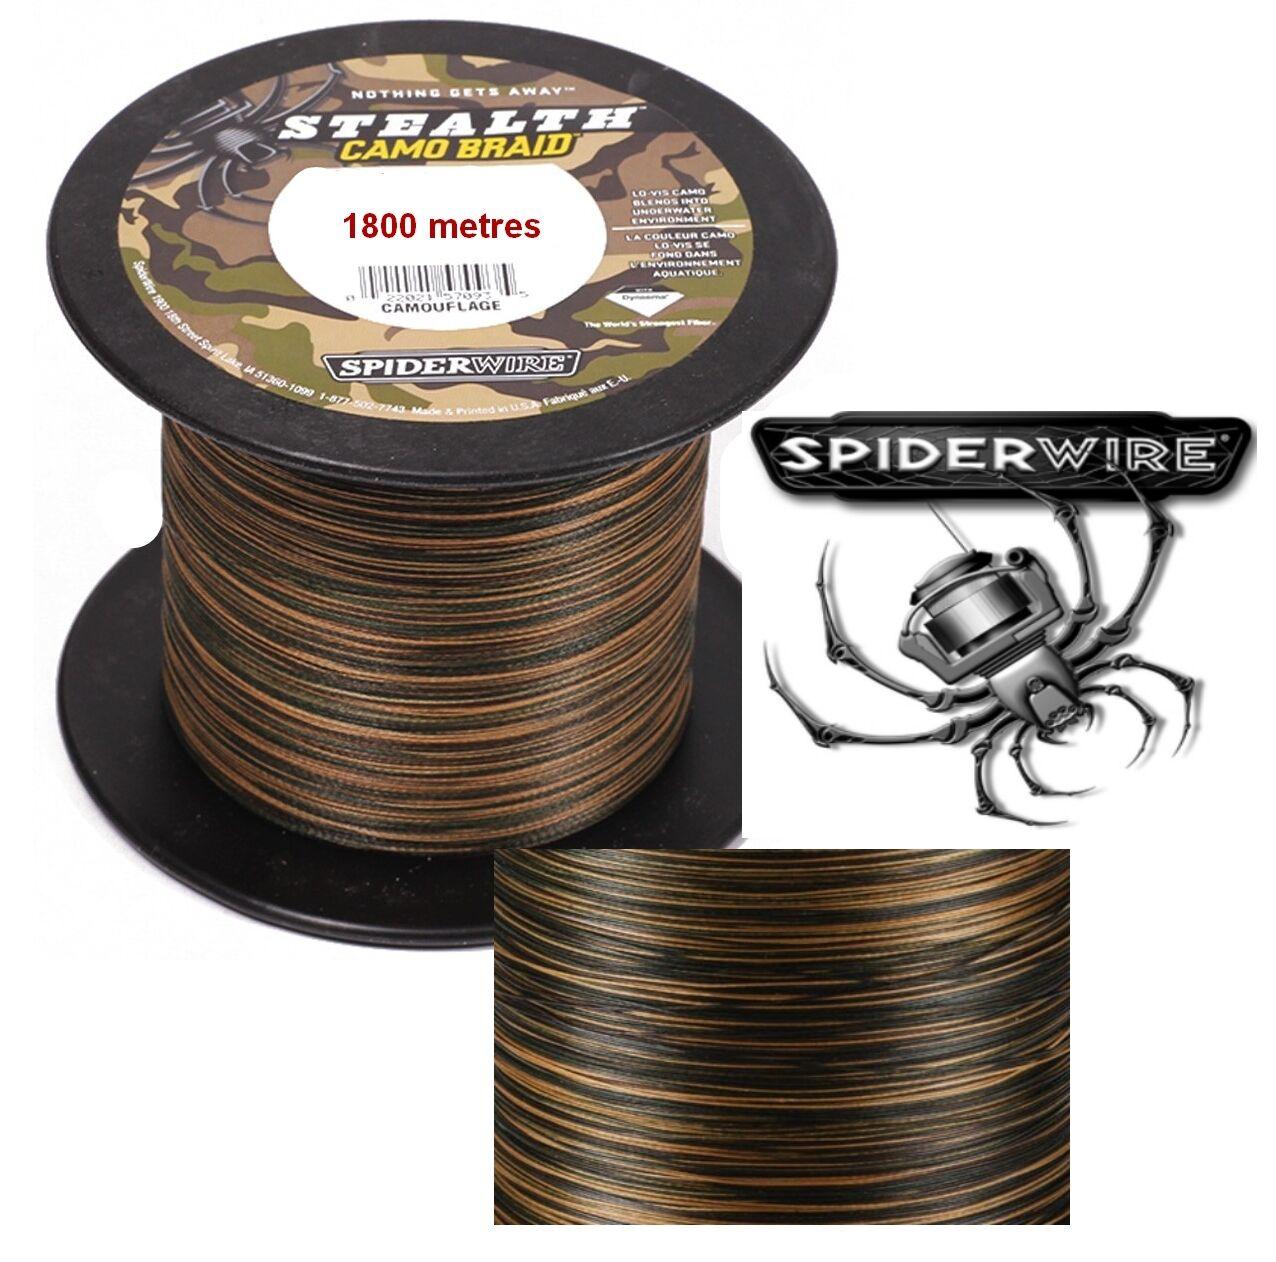 TRESSSE SPIDERWIRE 1800M STEALTH CAMOU BRAID 0.30  23KG  OU 0.40  53.6KG